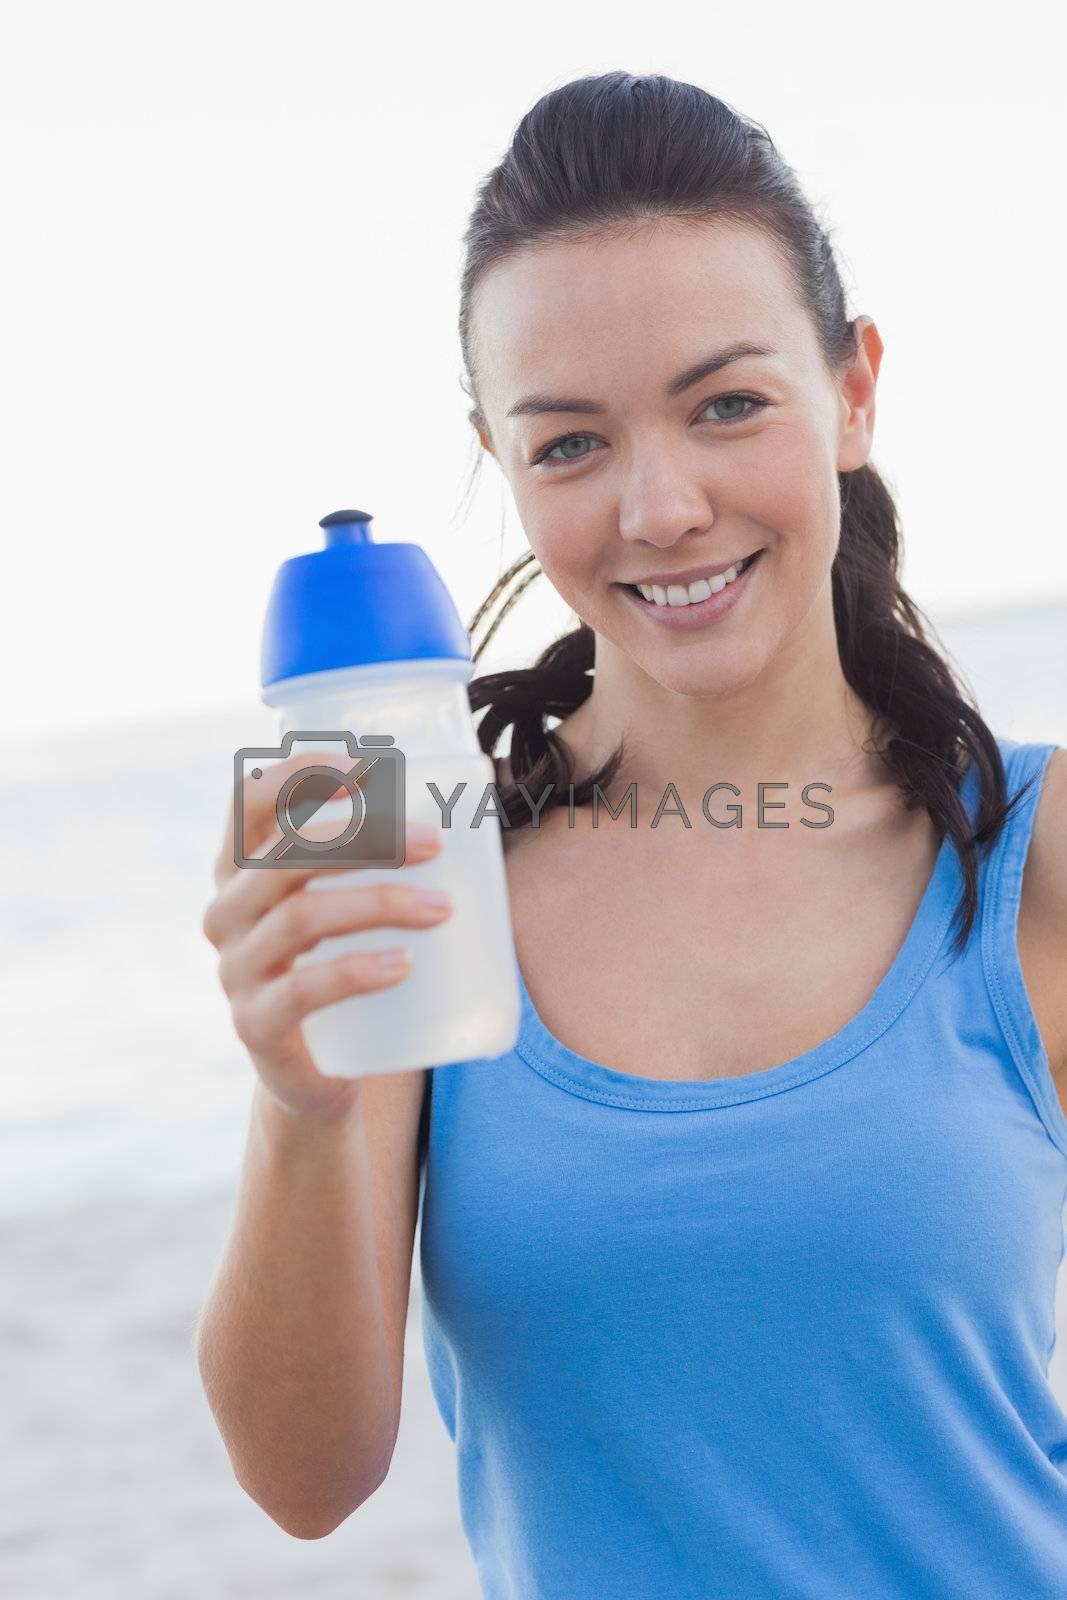 Smiling woman showing her water bottle by Wavebreakmedia